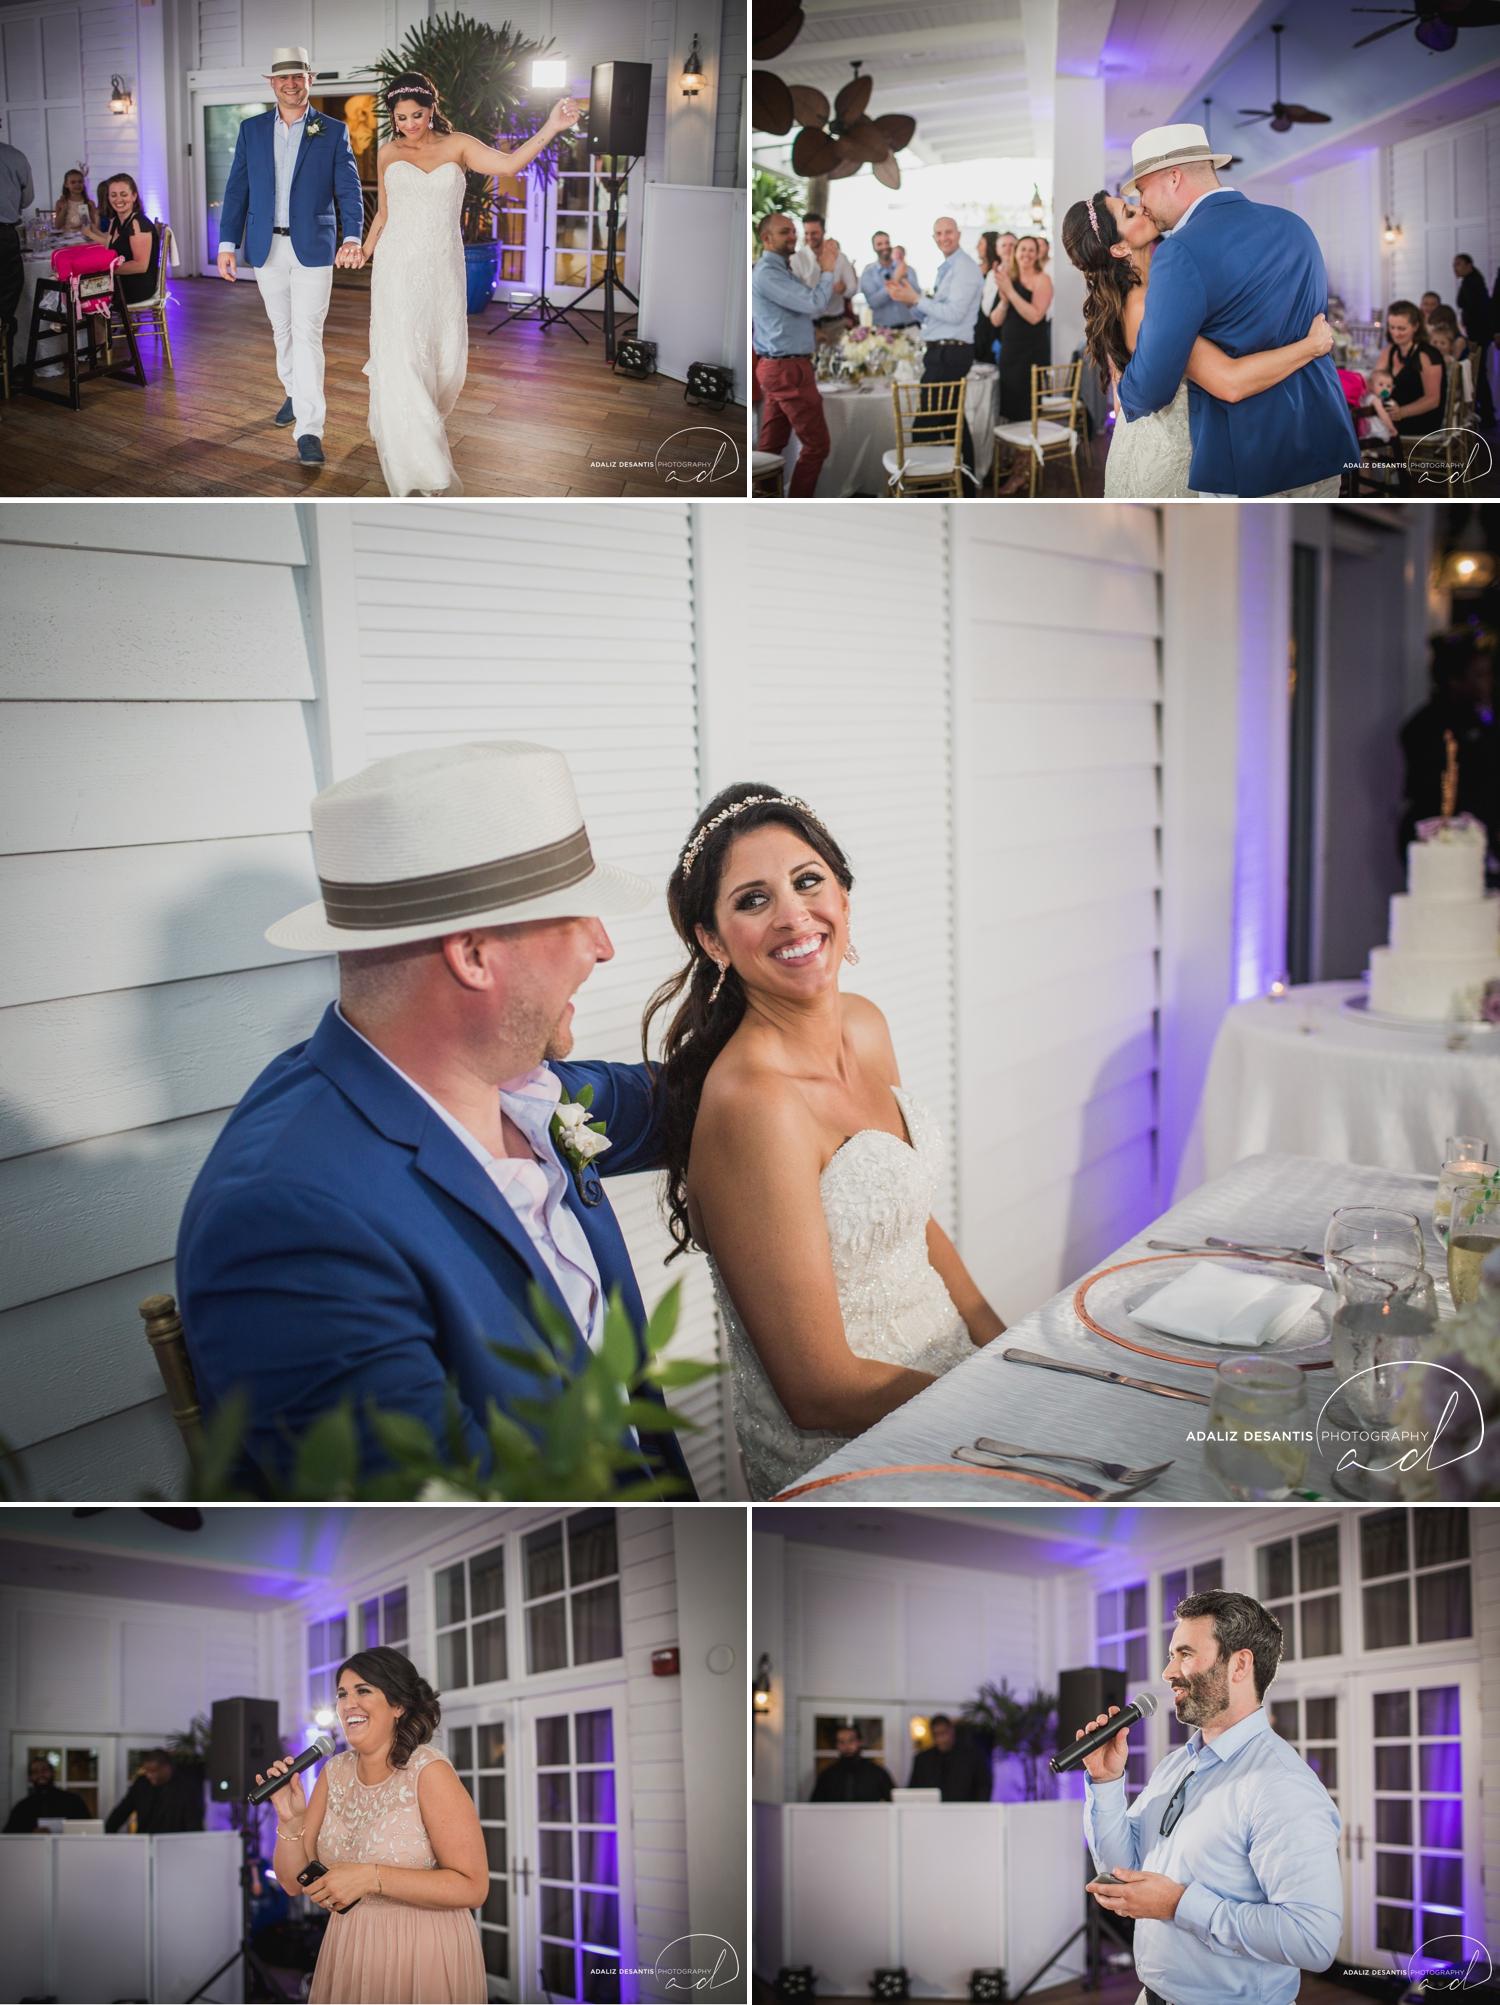 Carmen Alex palms hotel spa miami beach destination wedding lavender roses cuban cigar England cuba bride rose gold elegant Maggie Sottero Badgley Mischka 19.jpg